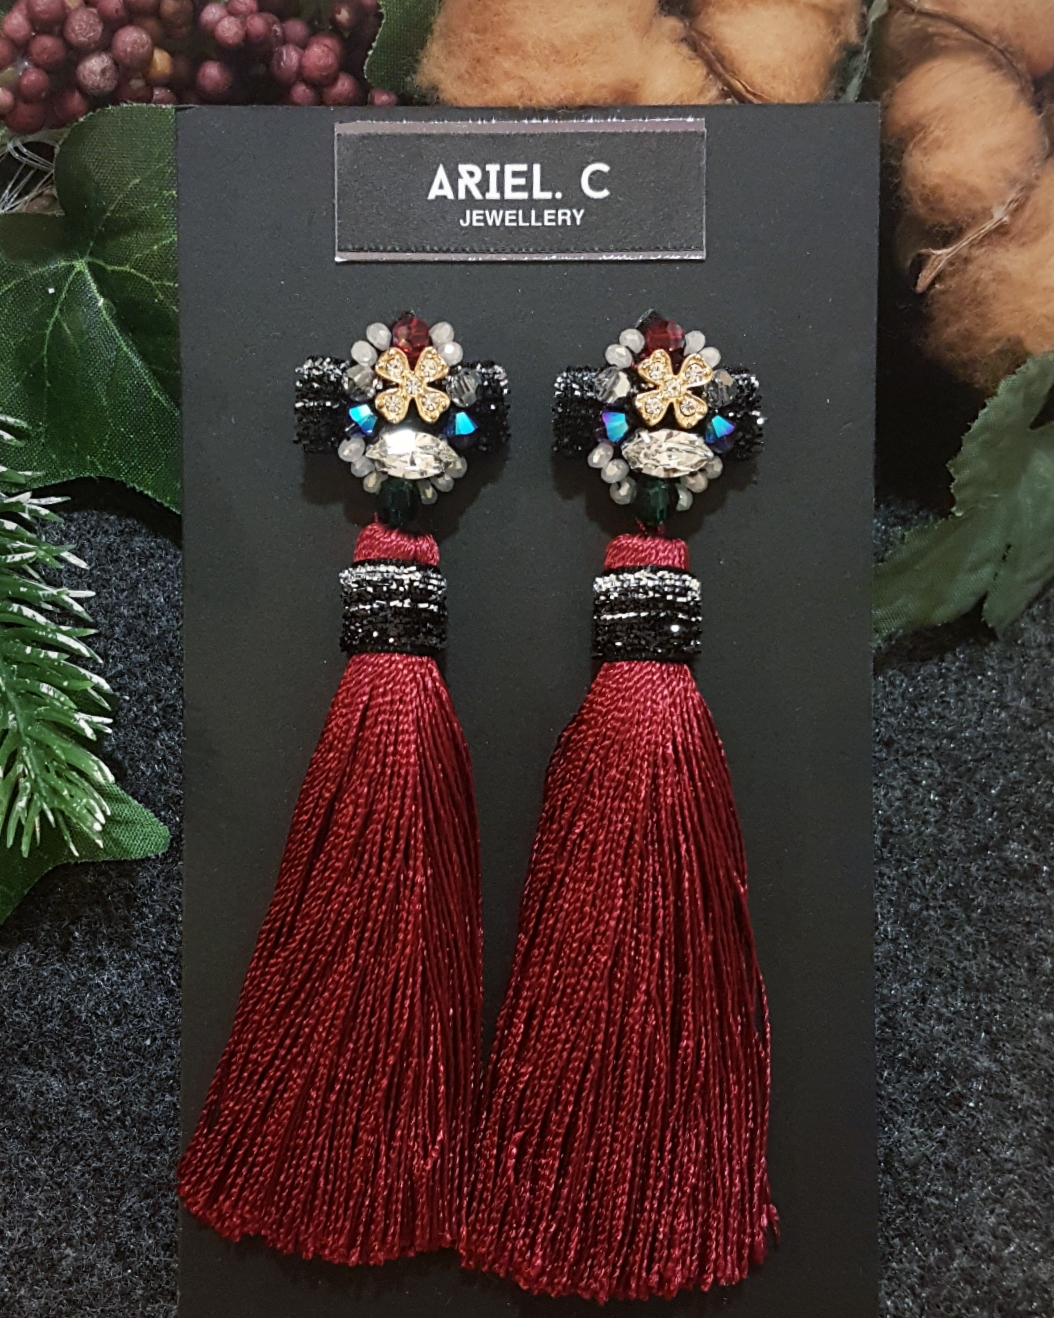   ARSS11   Rouge Regal